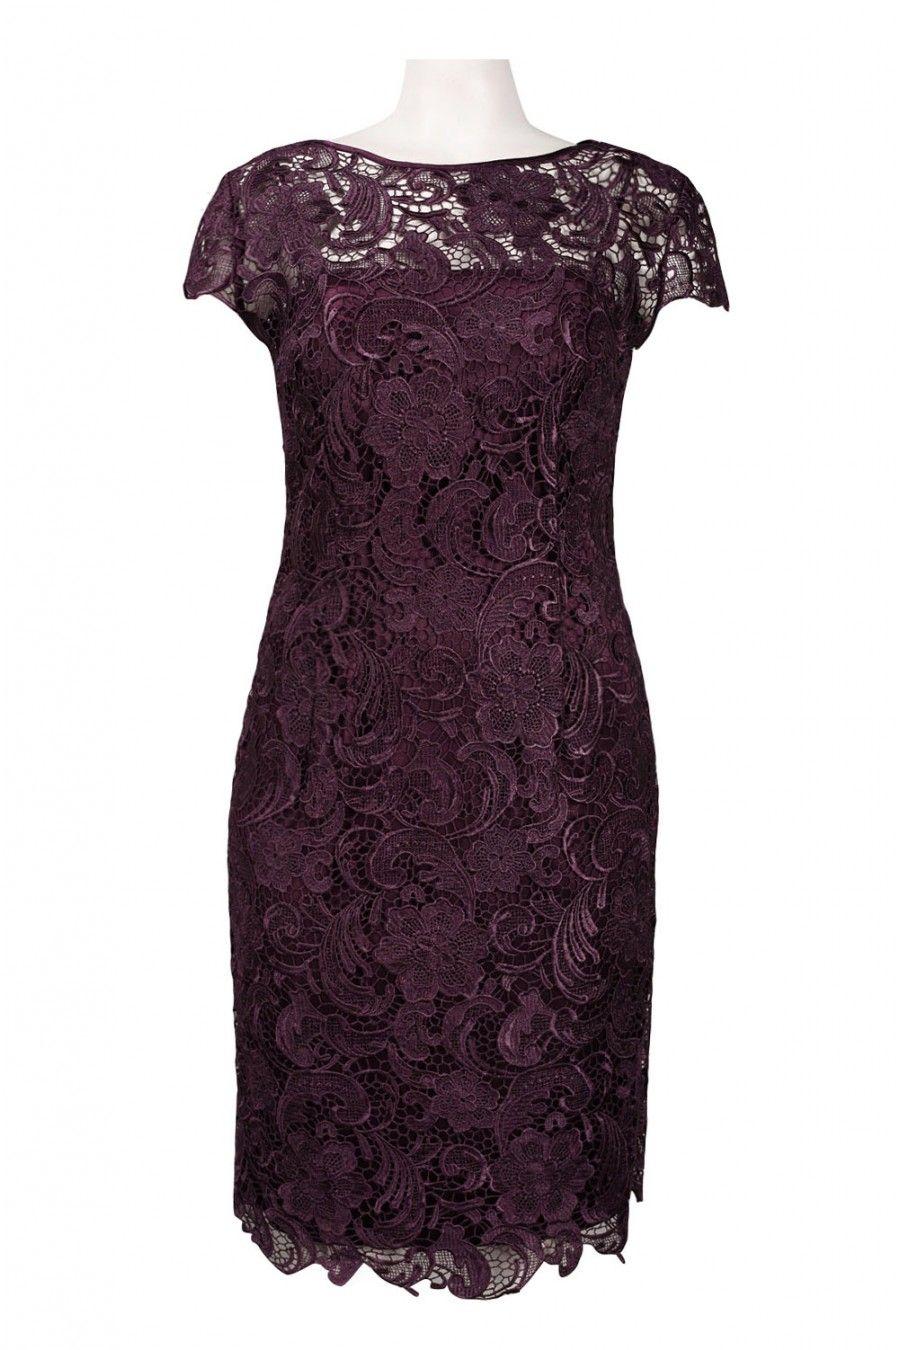 eggplant mother of the bride short dresses | patra illusion